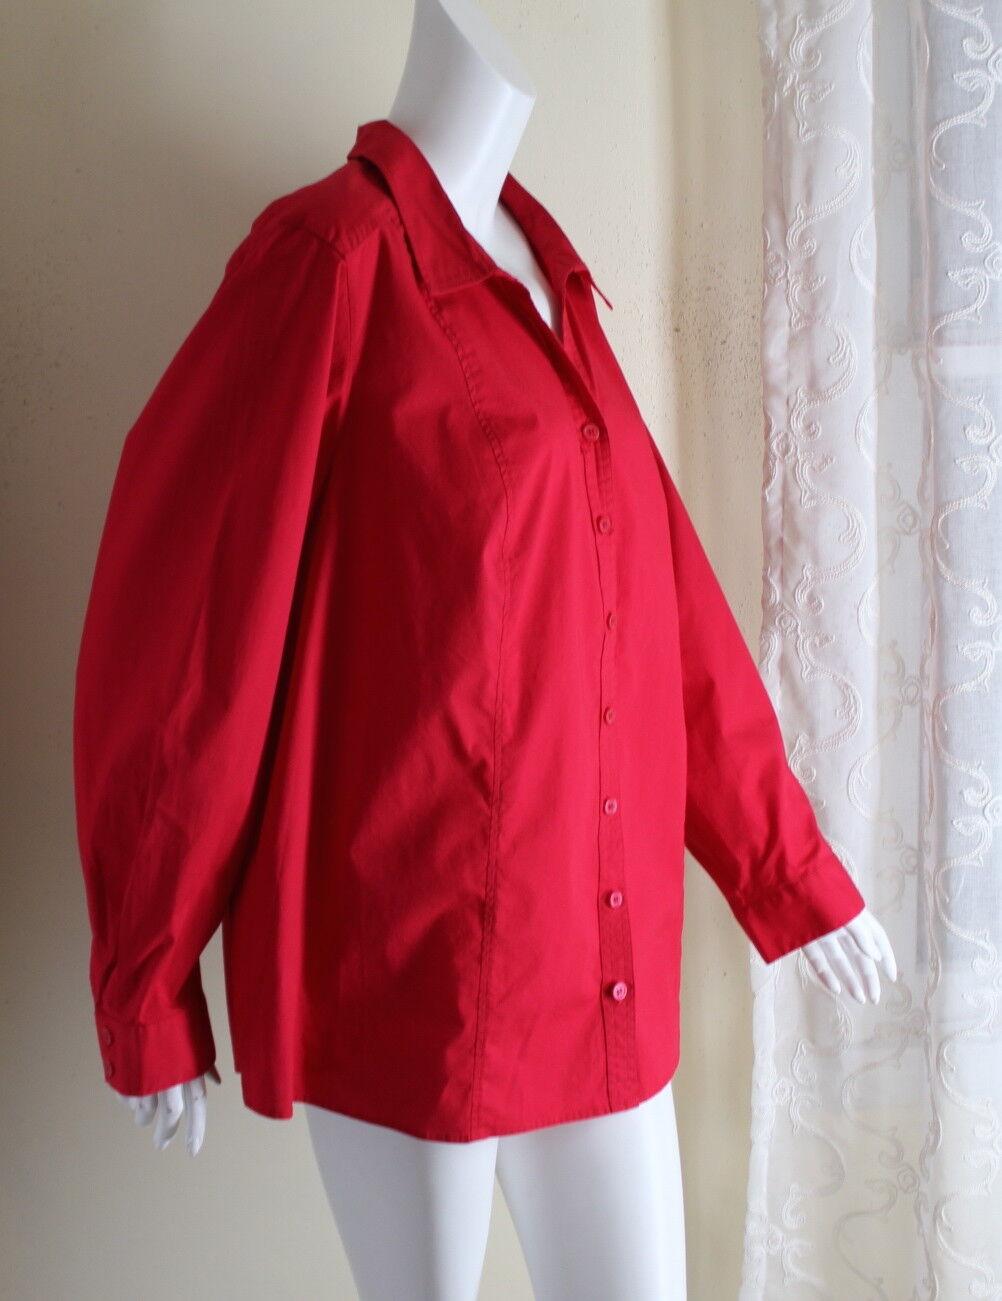 NWT CJ Banks -Sz 3X Soft rot Crisp Cotton Spandex Elegant Dress Shirt